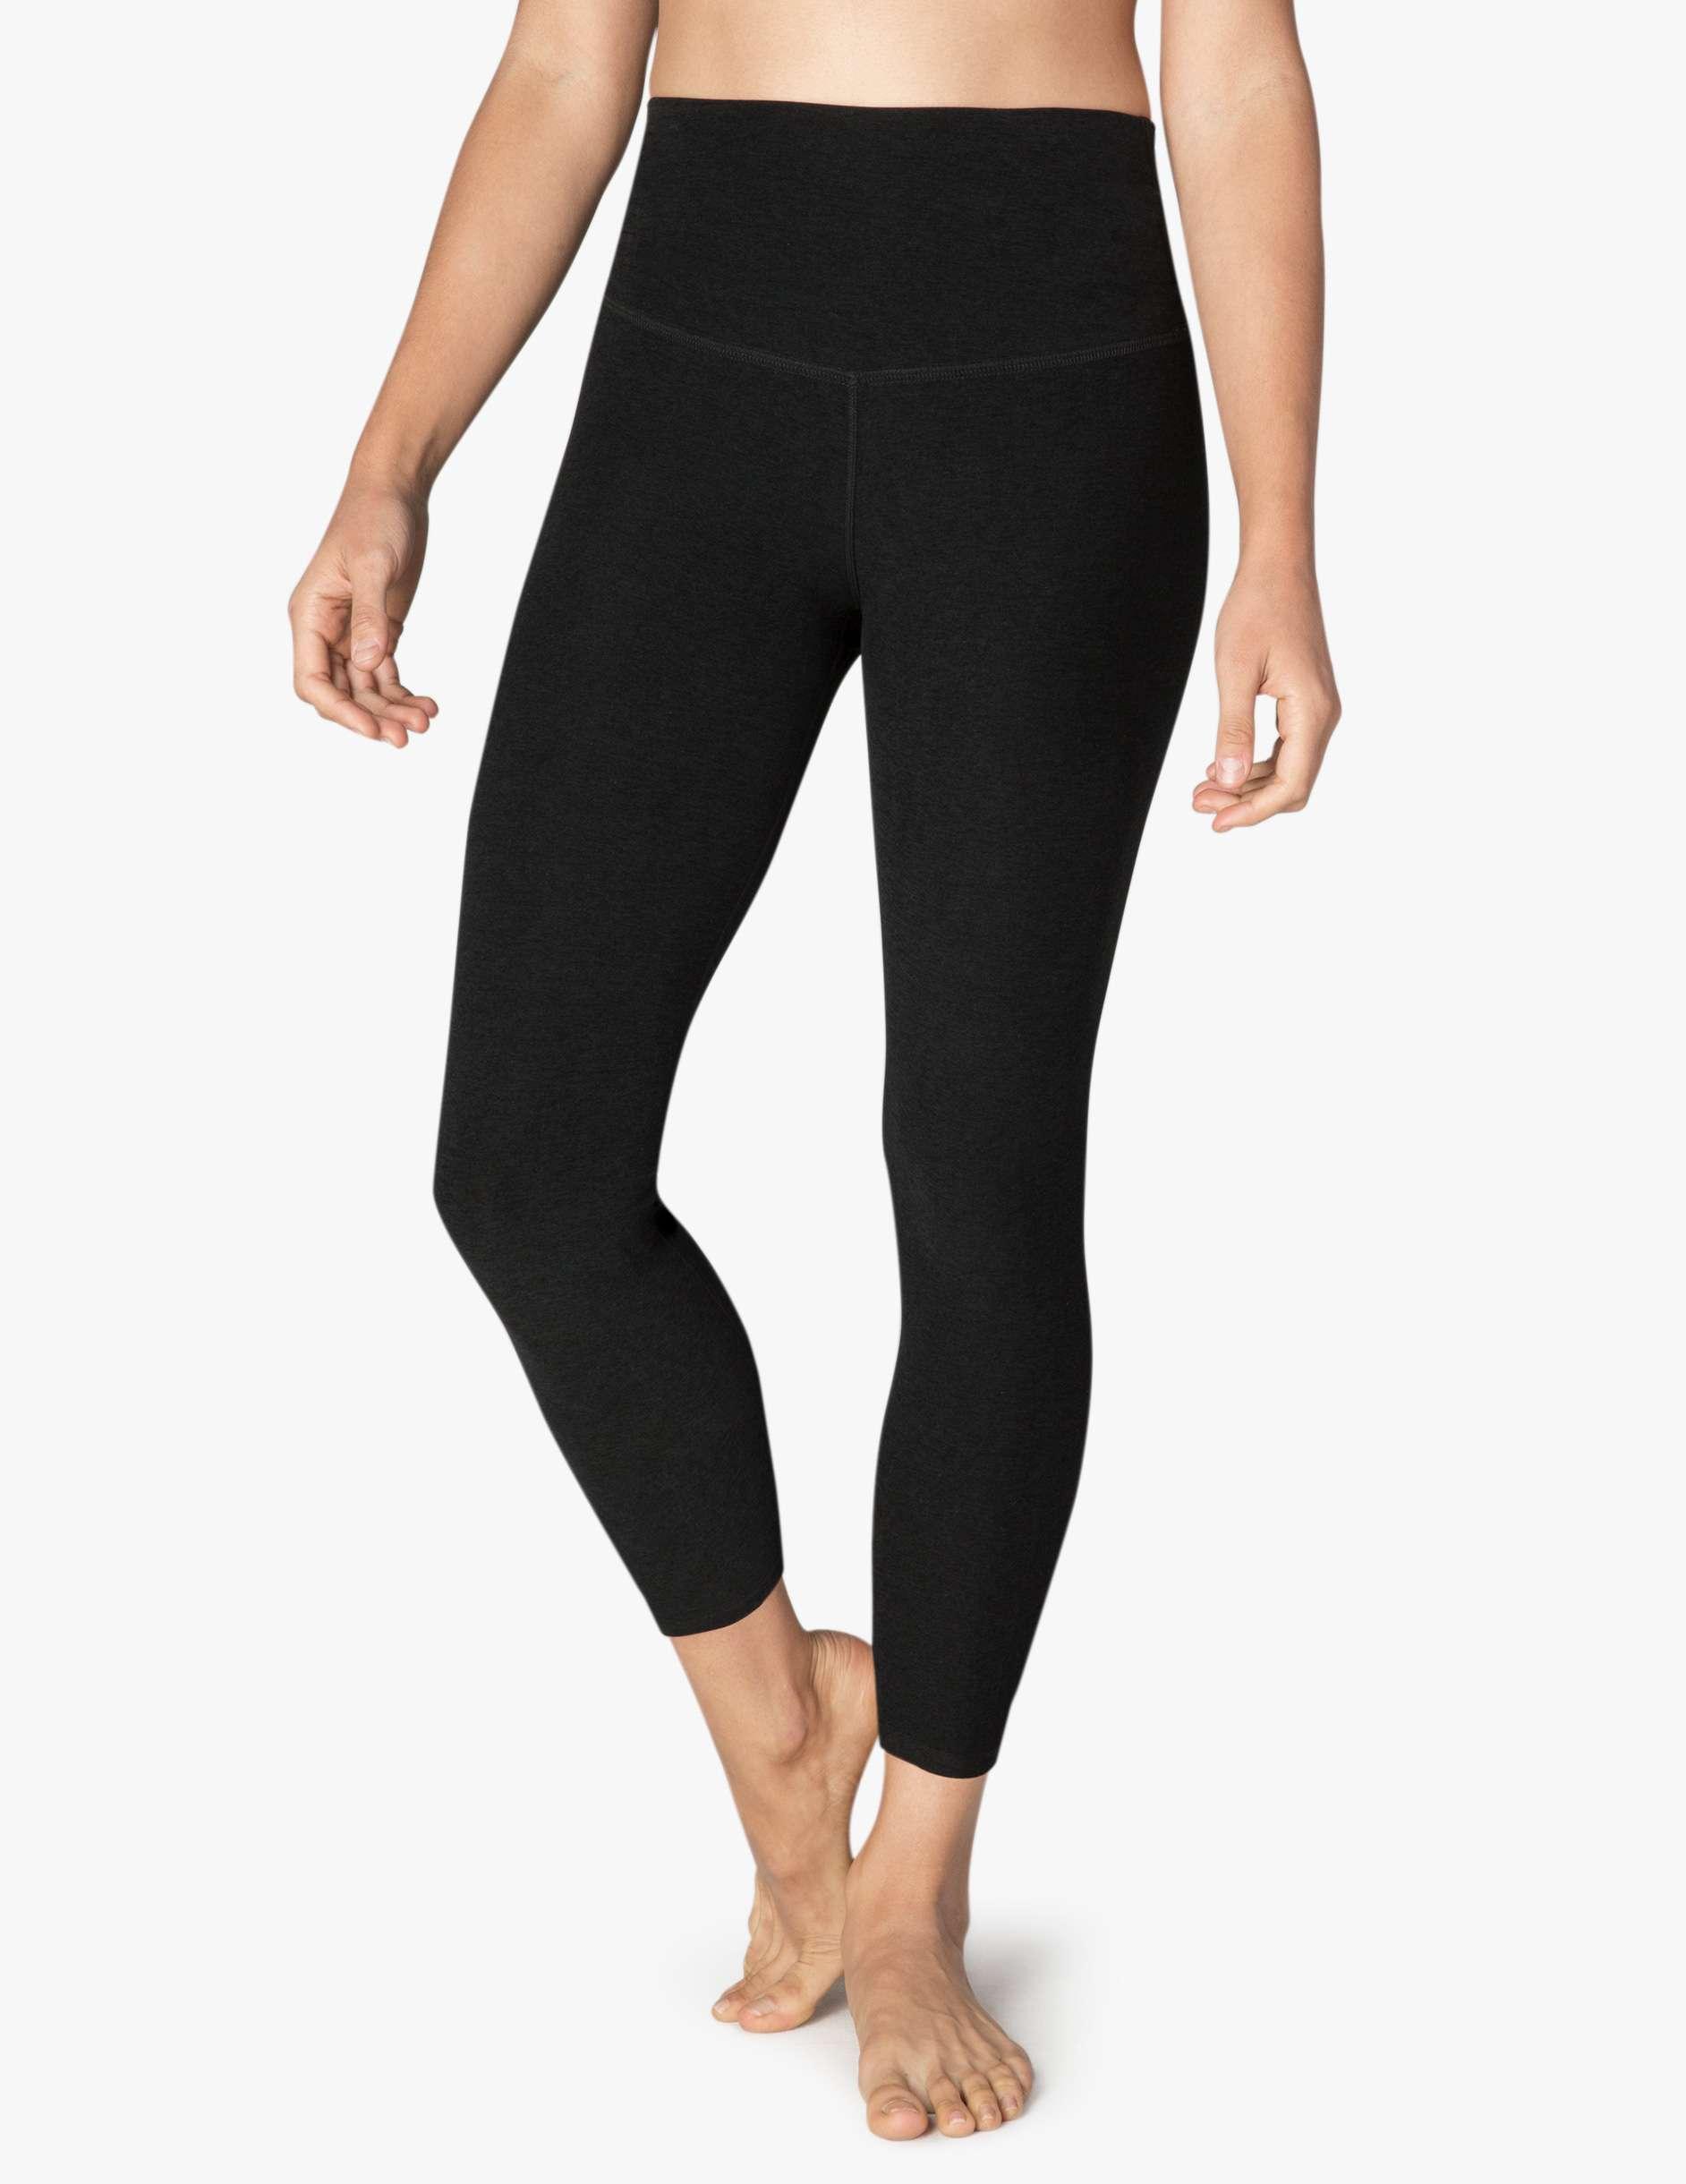 Beyond Yoga Spacedye High Waist Midi Yoga Leggings